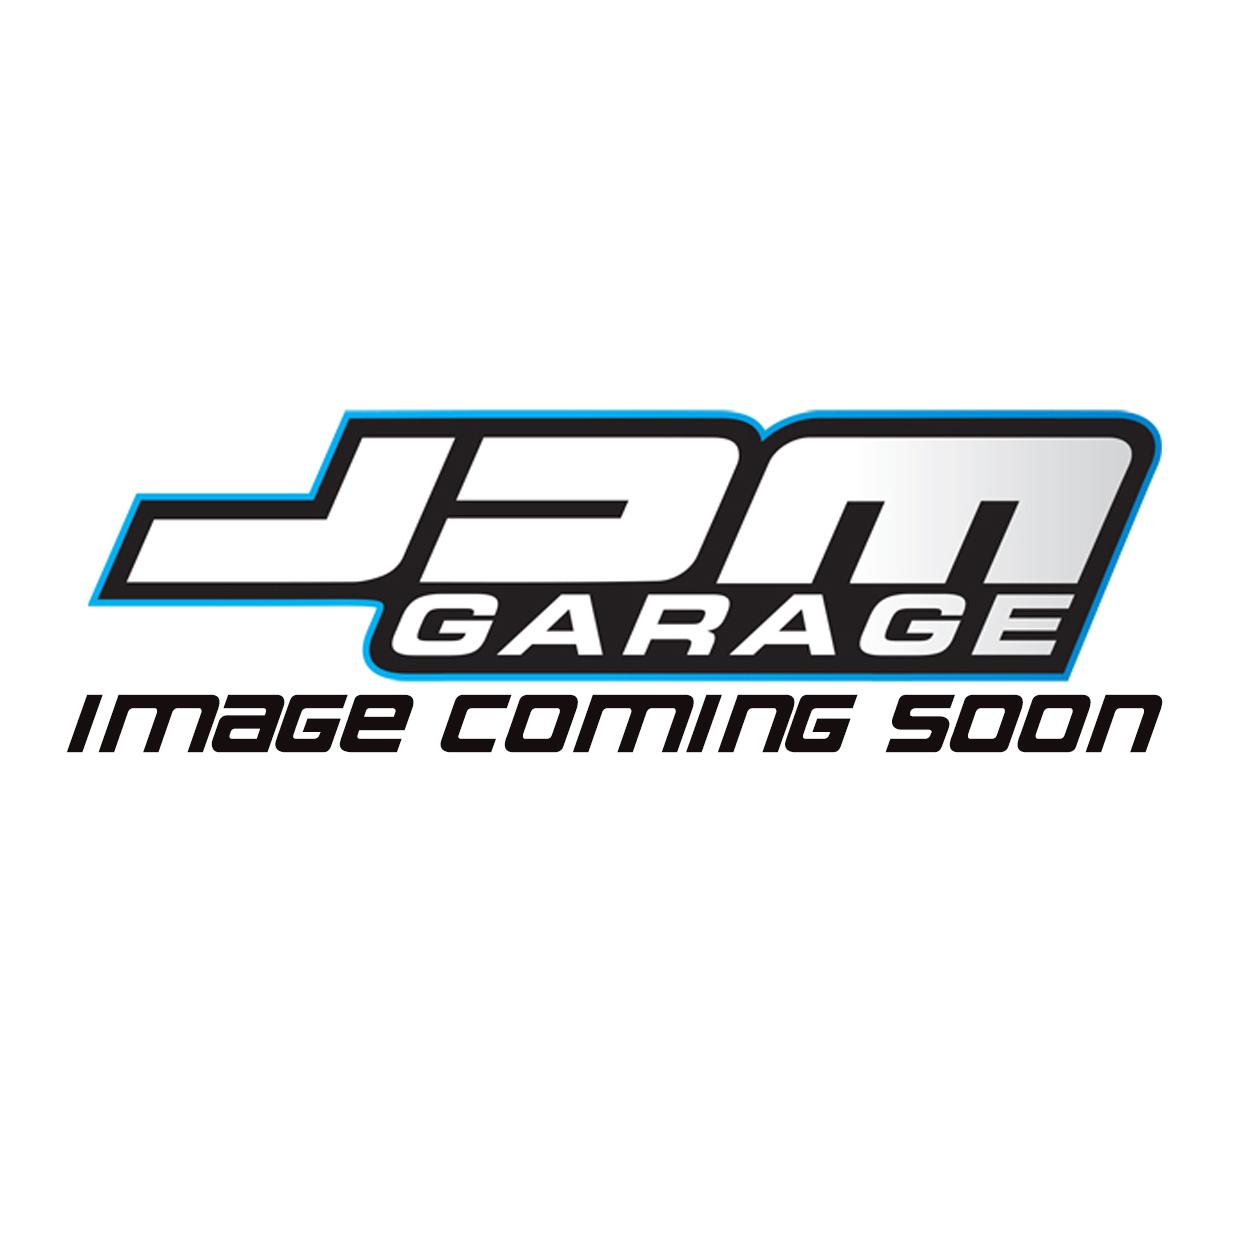 Genuine Timing Belt Cambelt Fits Subaru Impreza WRX STI / Forester / Legacy EJ154 EJ204 EJ205 EJ207 EJ255 EJ257